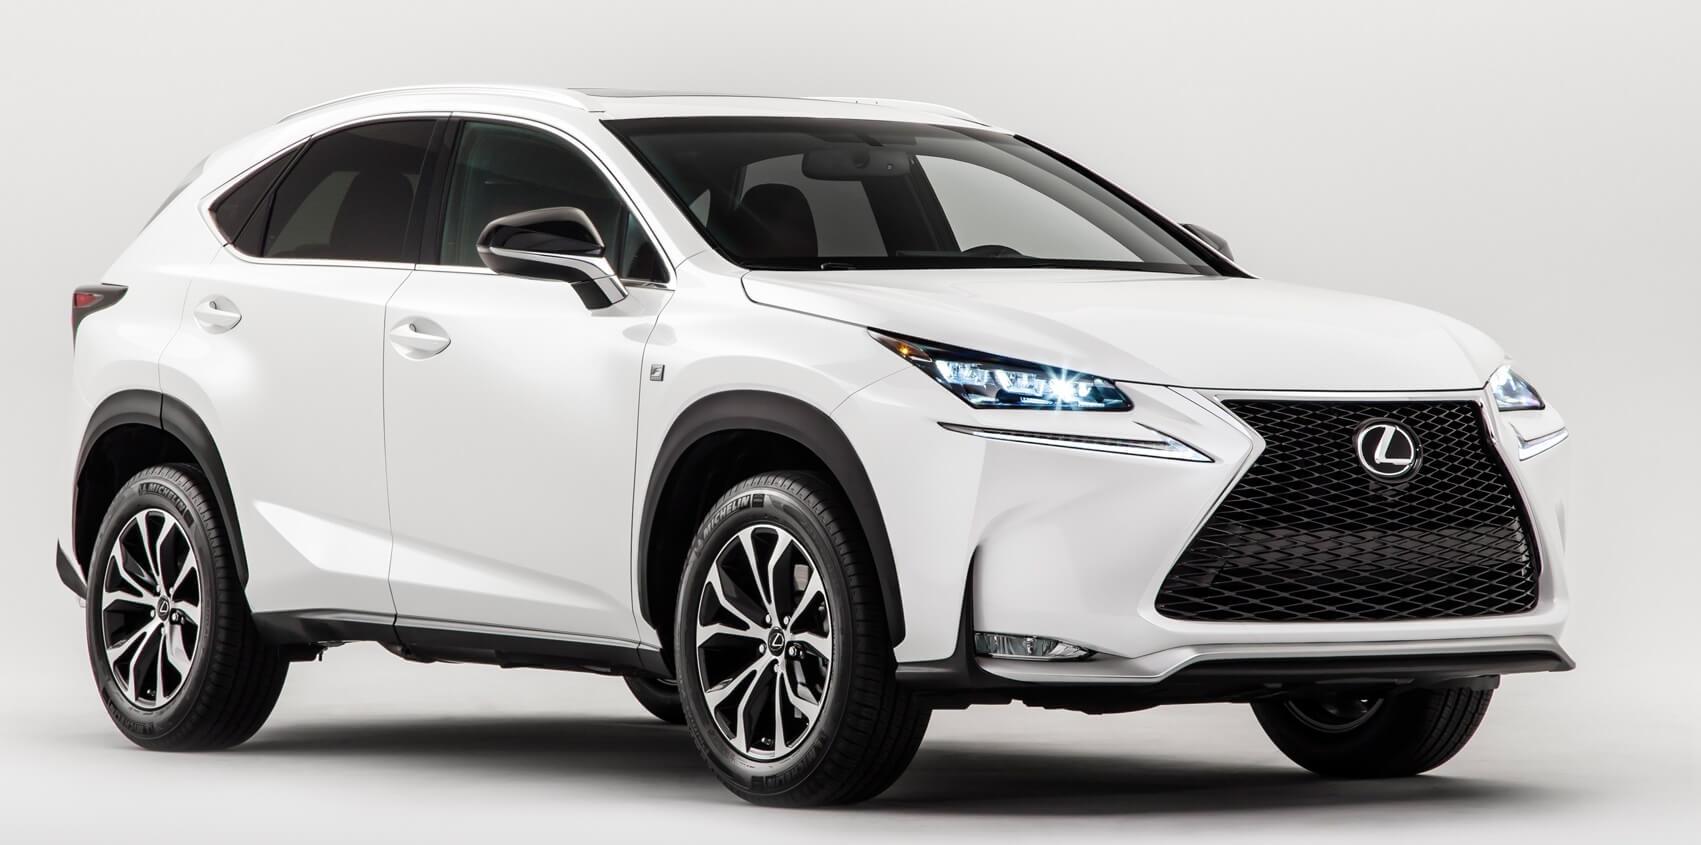 2015-lexus-nx-200t-f-sport-front-three-quarter-promo